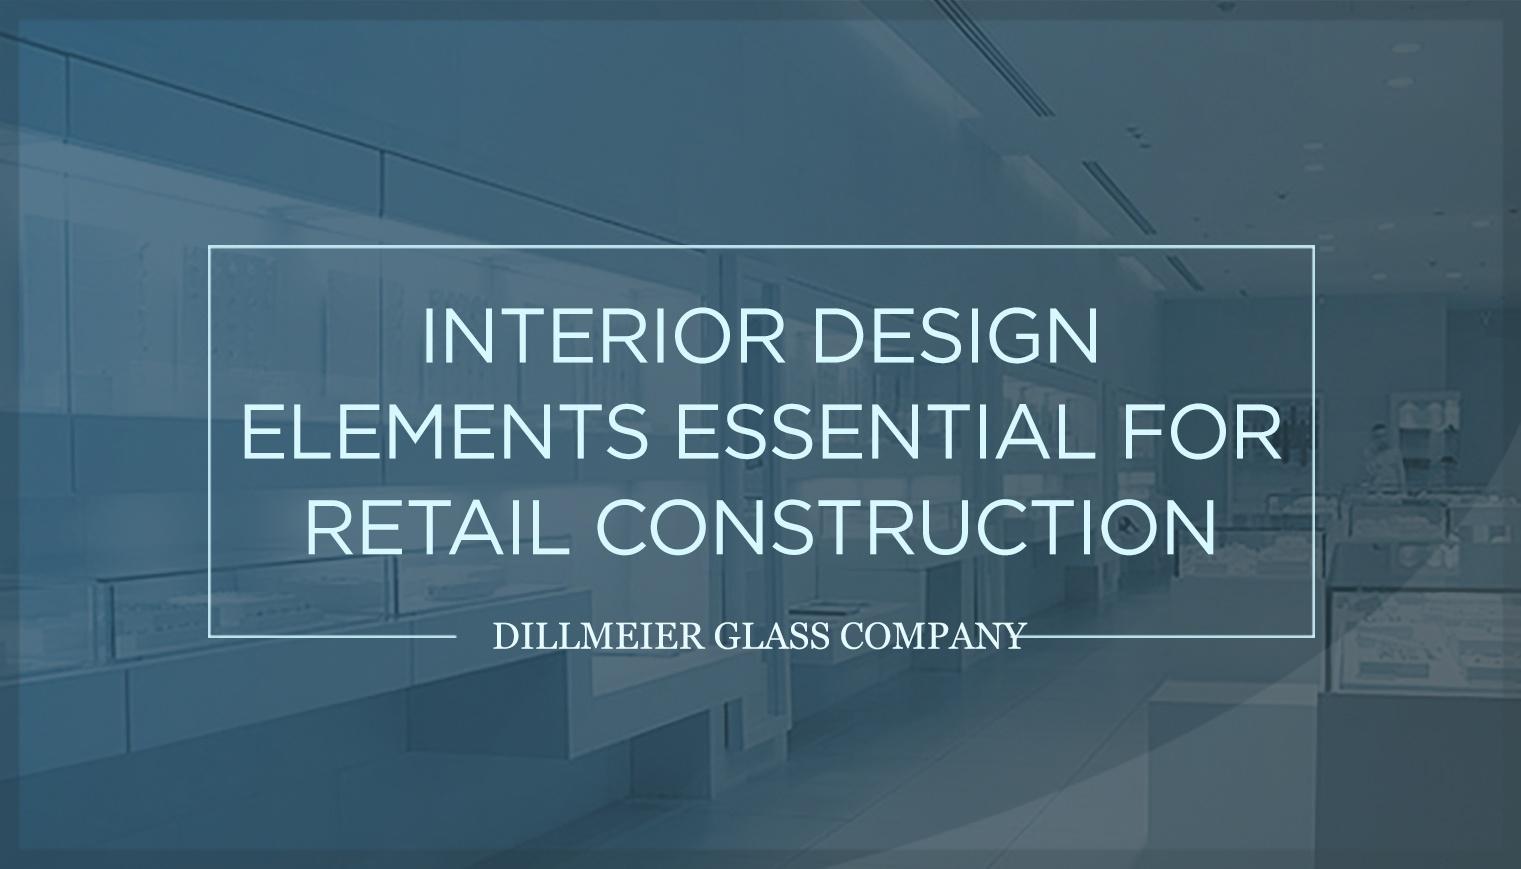 Interior Design Elements Essential for Retail Construction